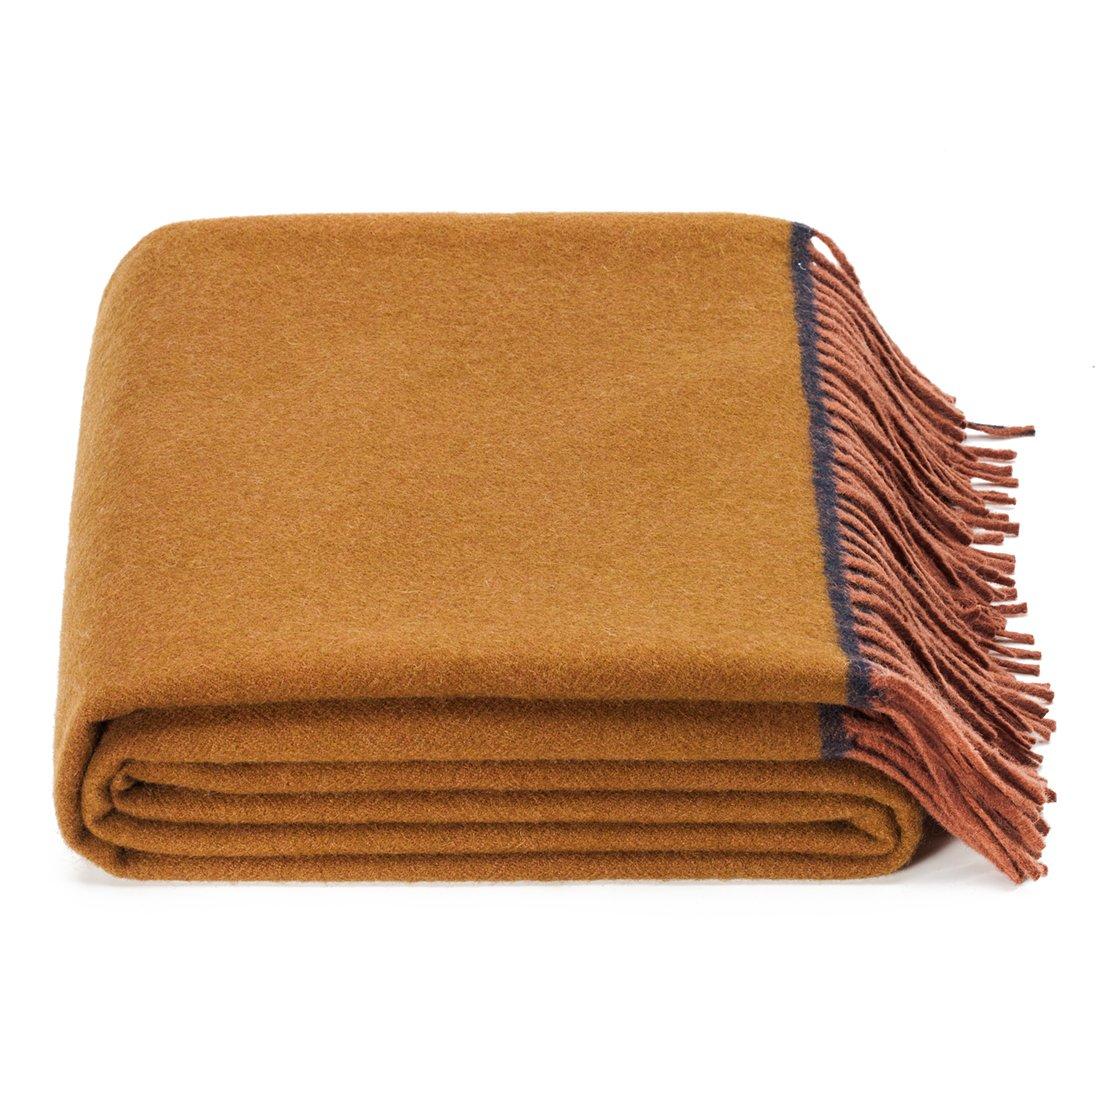 SPENCER&WHITNEY Super Blanket Soft Throw Australian 100 Wool Super Soft Blanket Light And Breathability Blanket Wool Throw